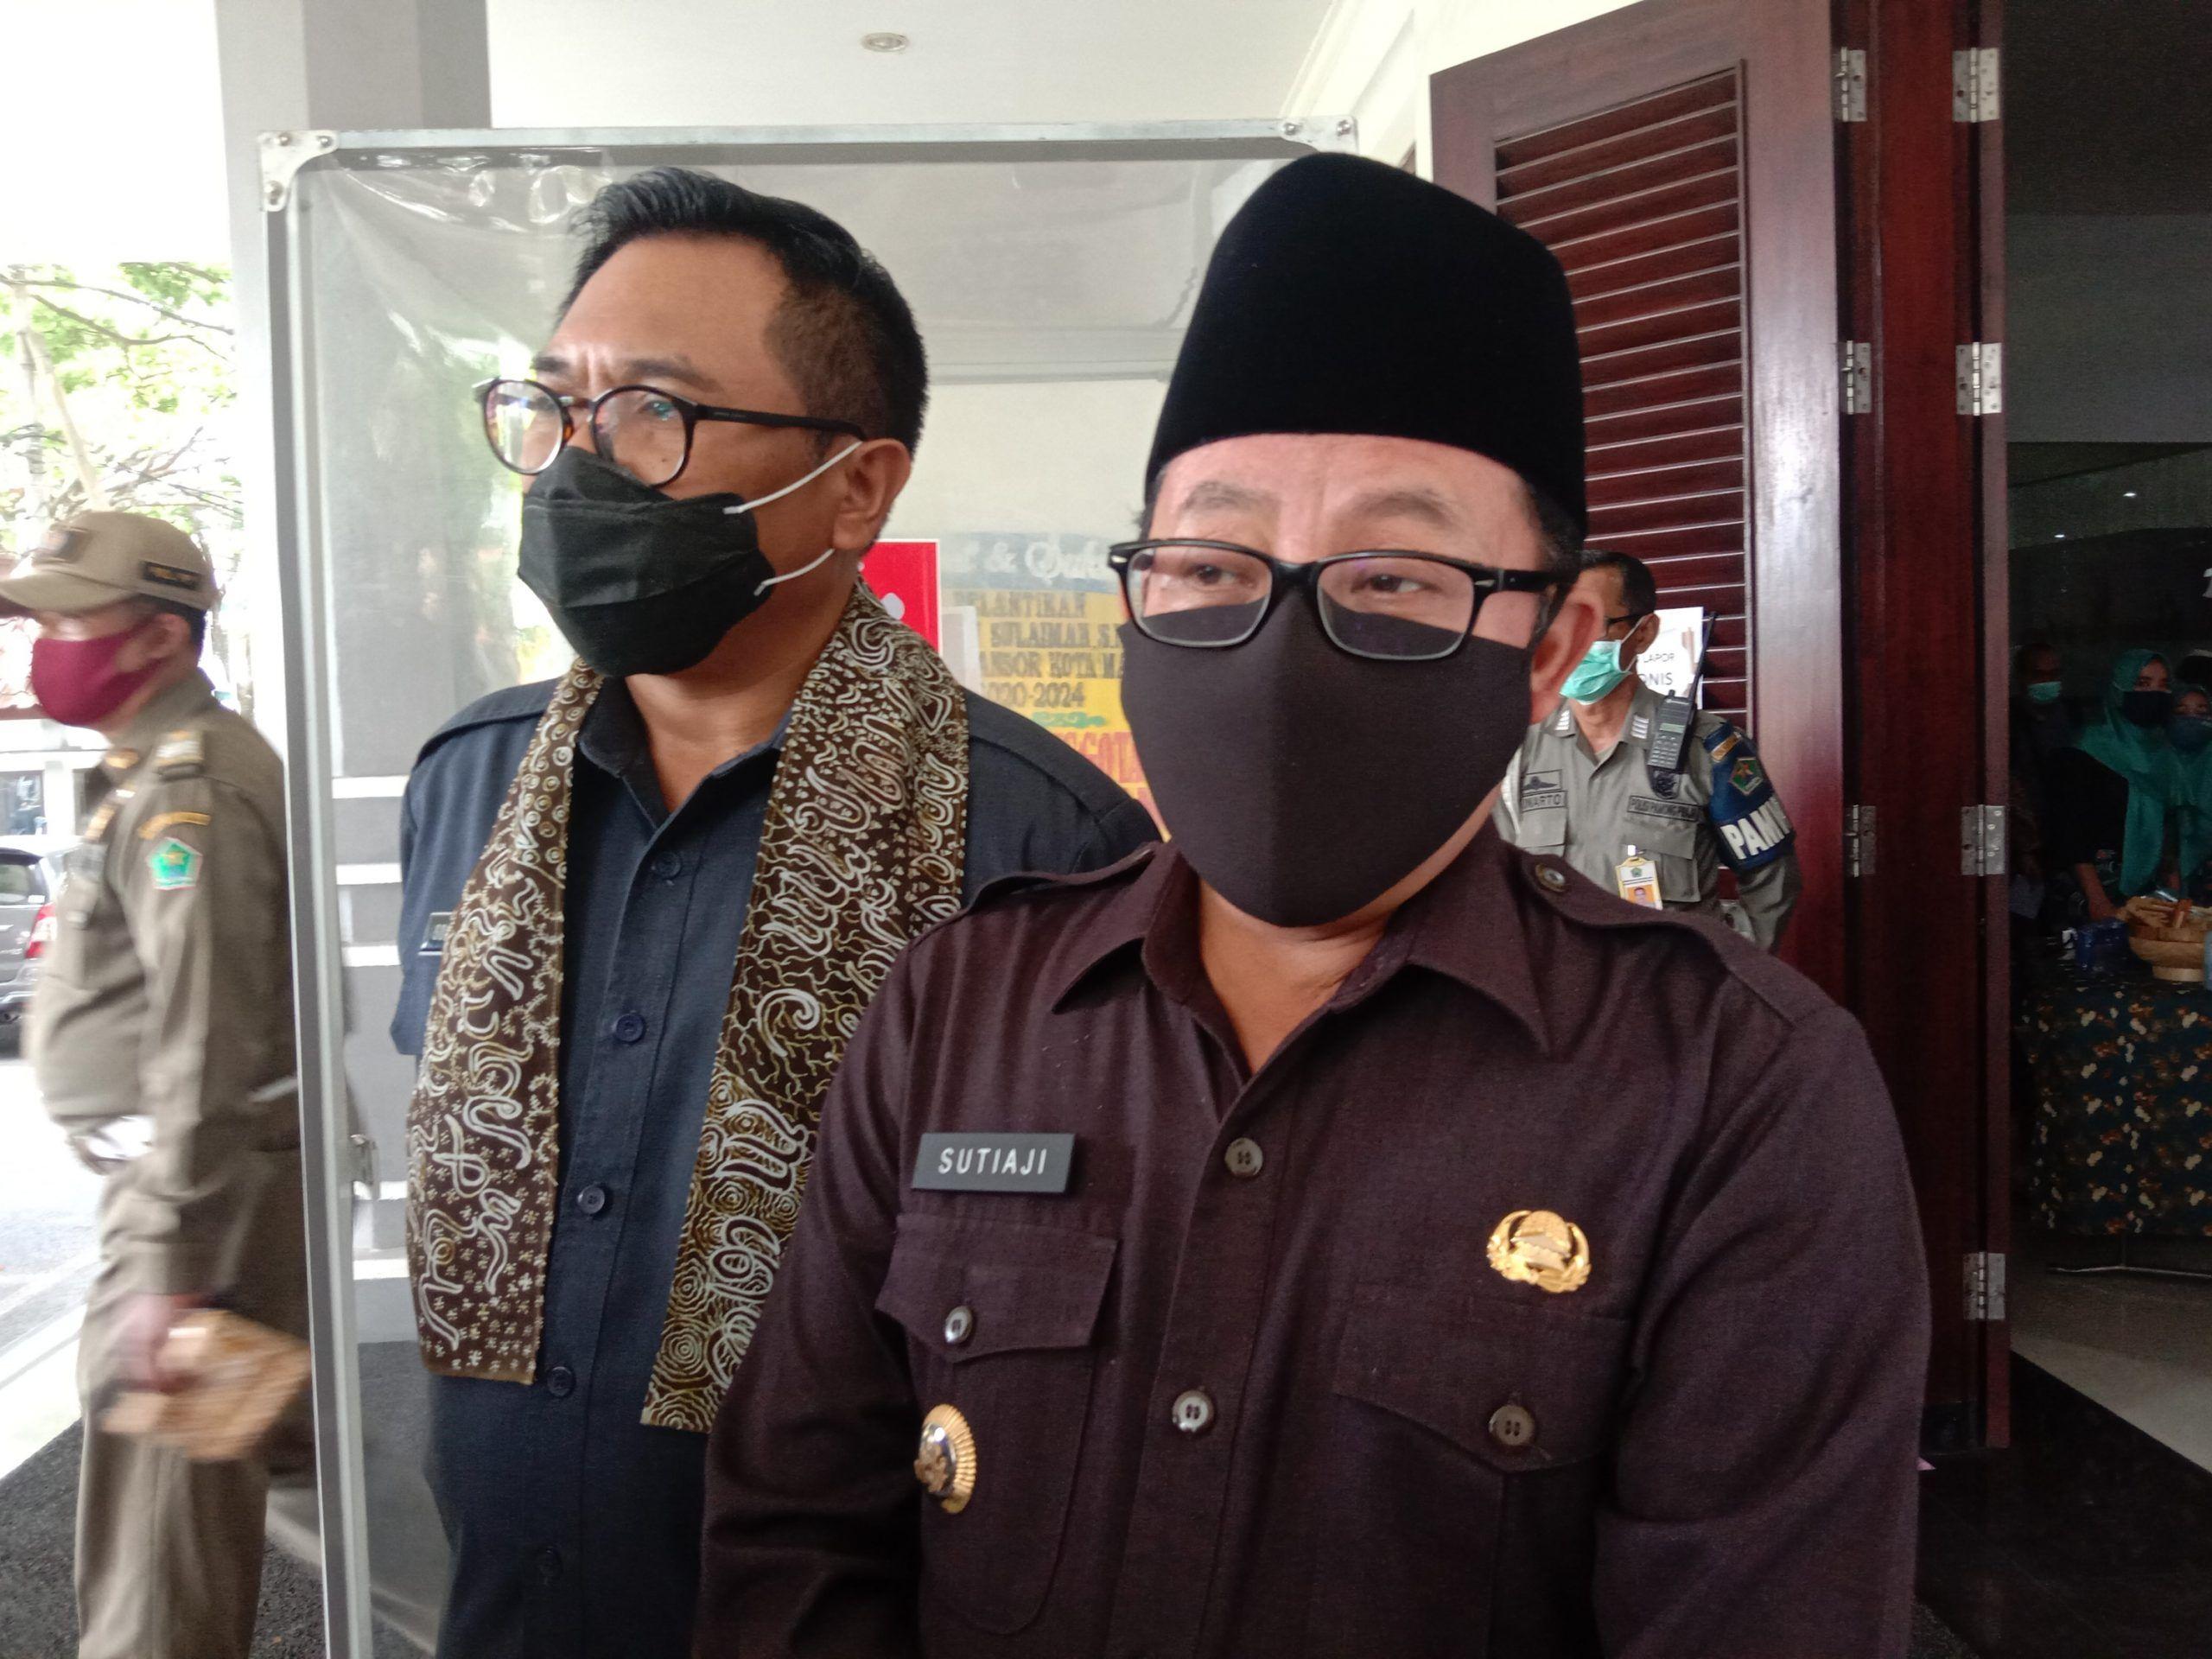 Wali Kota Malang Sutiaji melarang pesta tahun baru